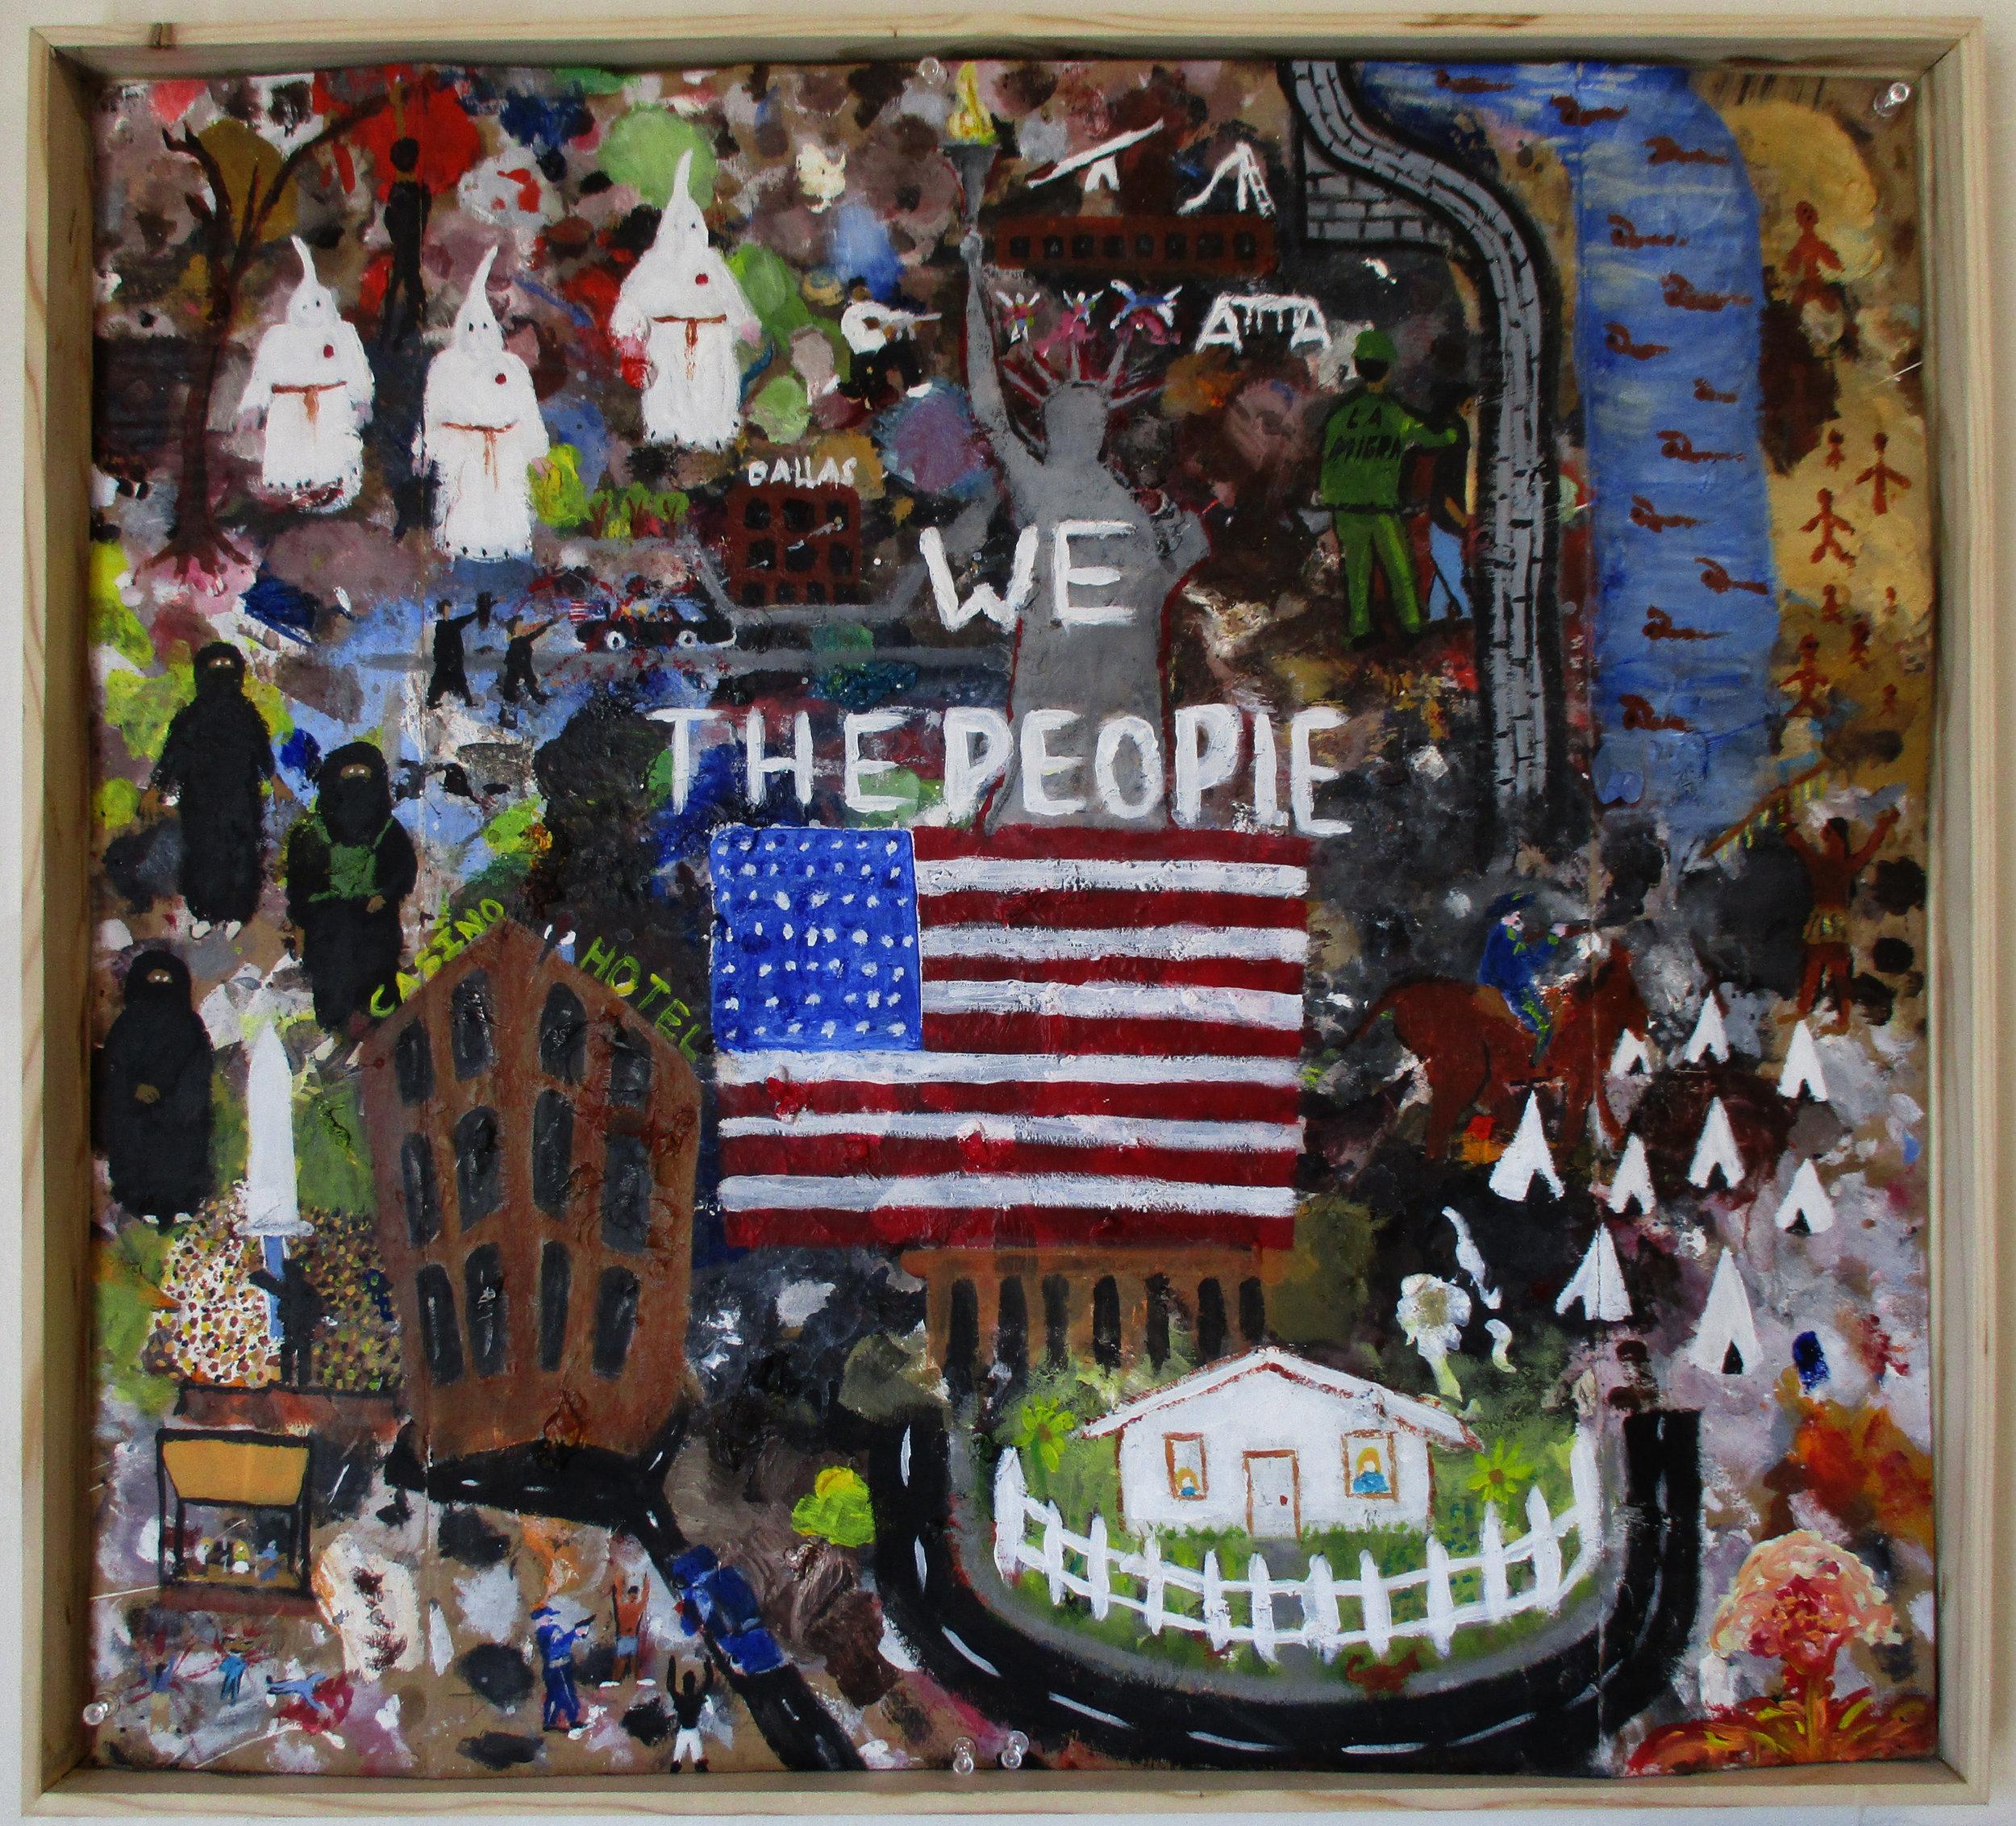 We The People - Acrylic on cardboard